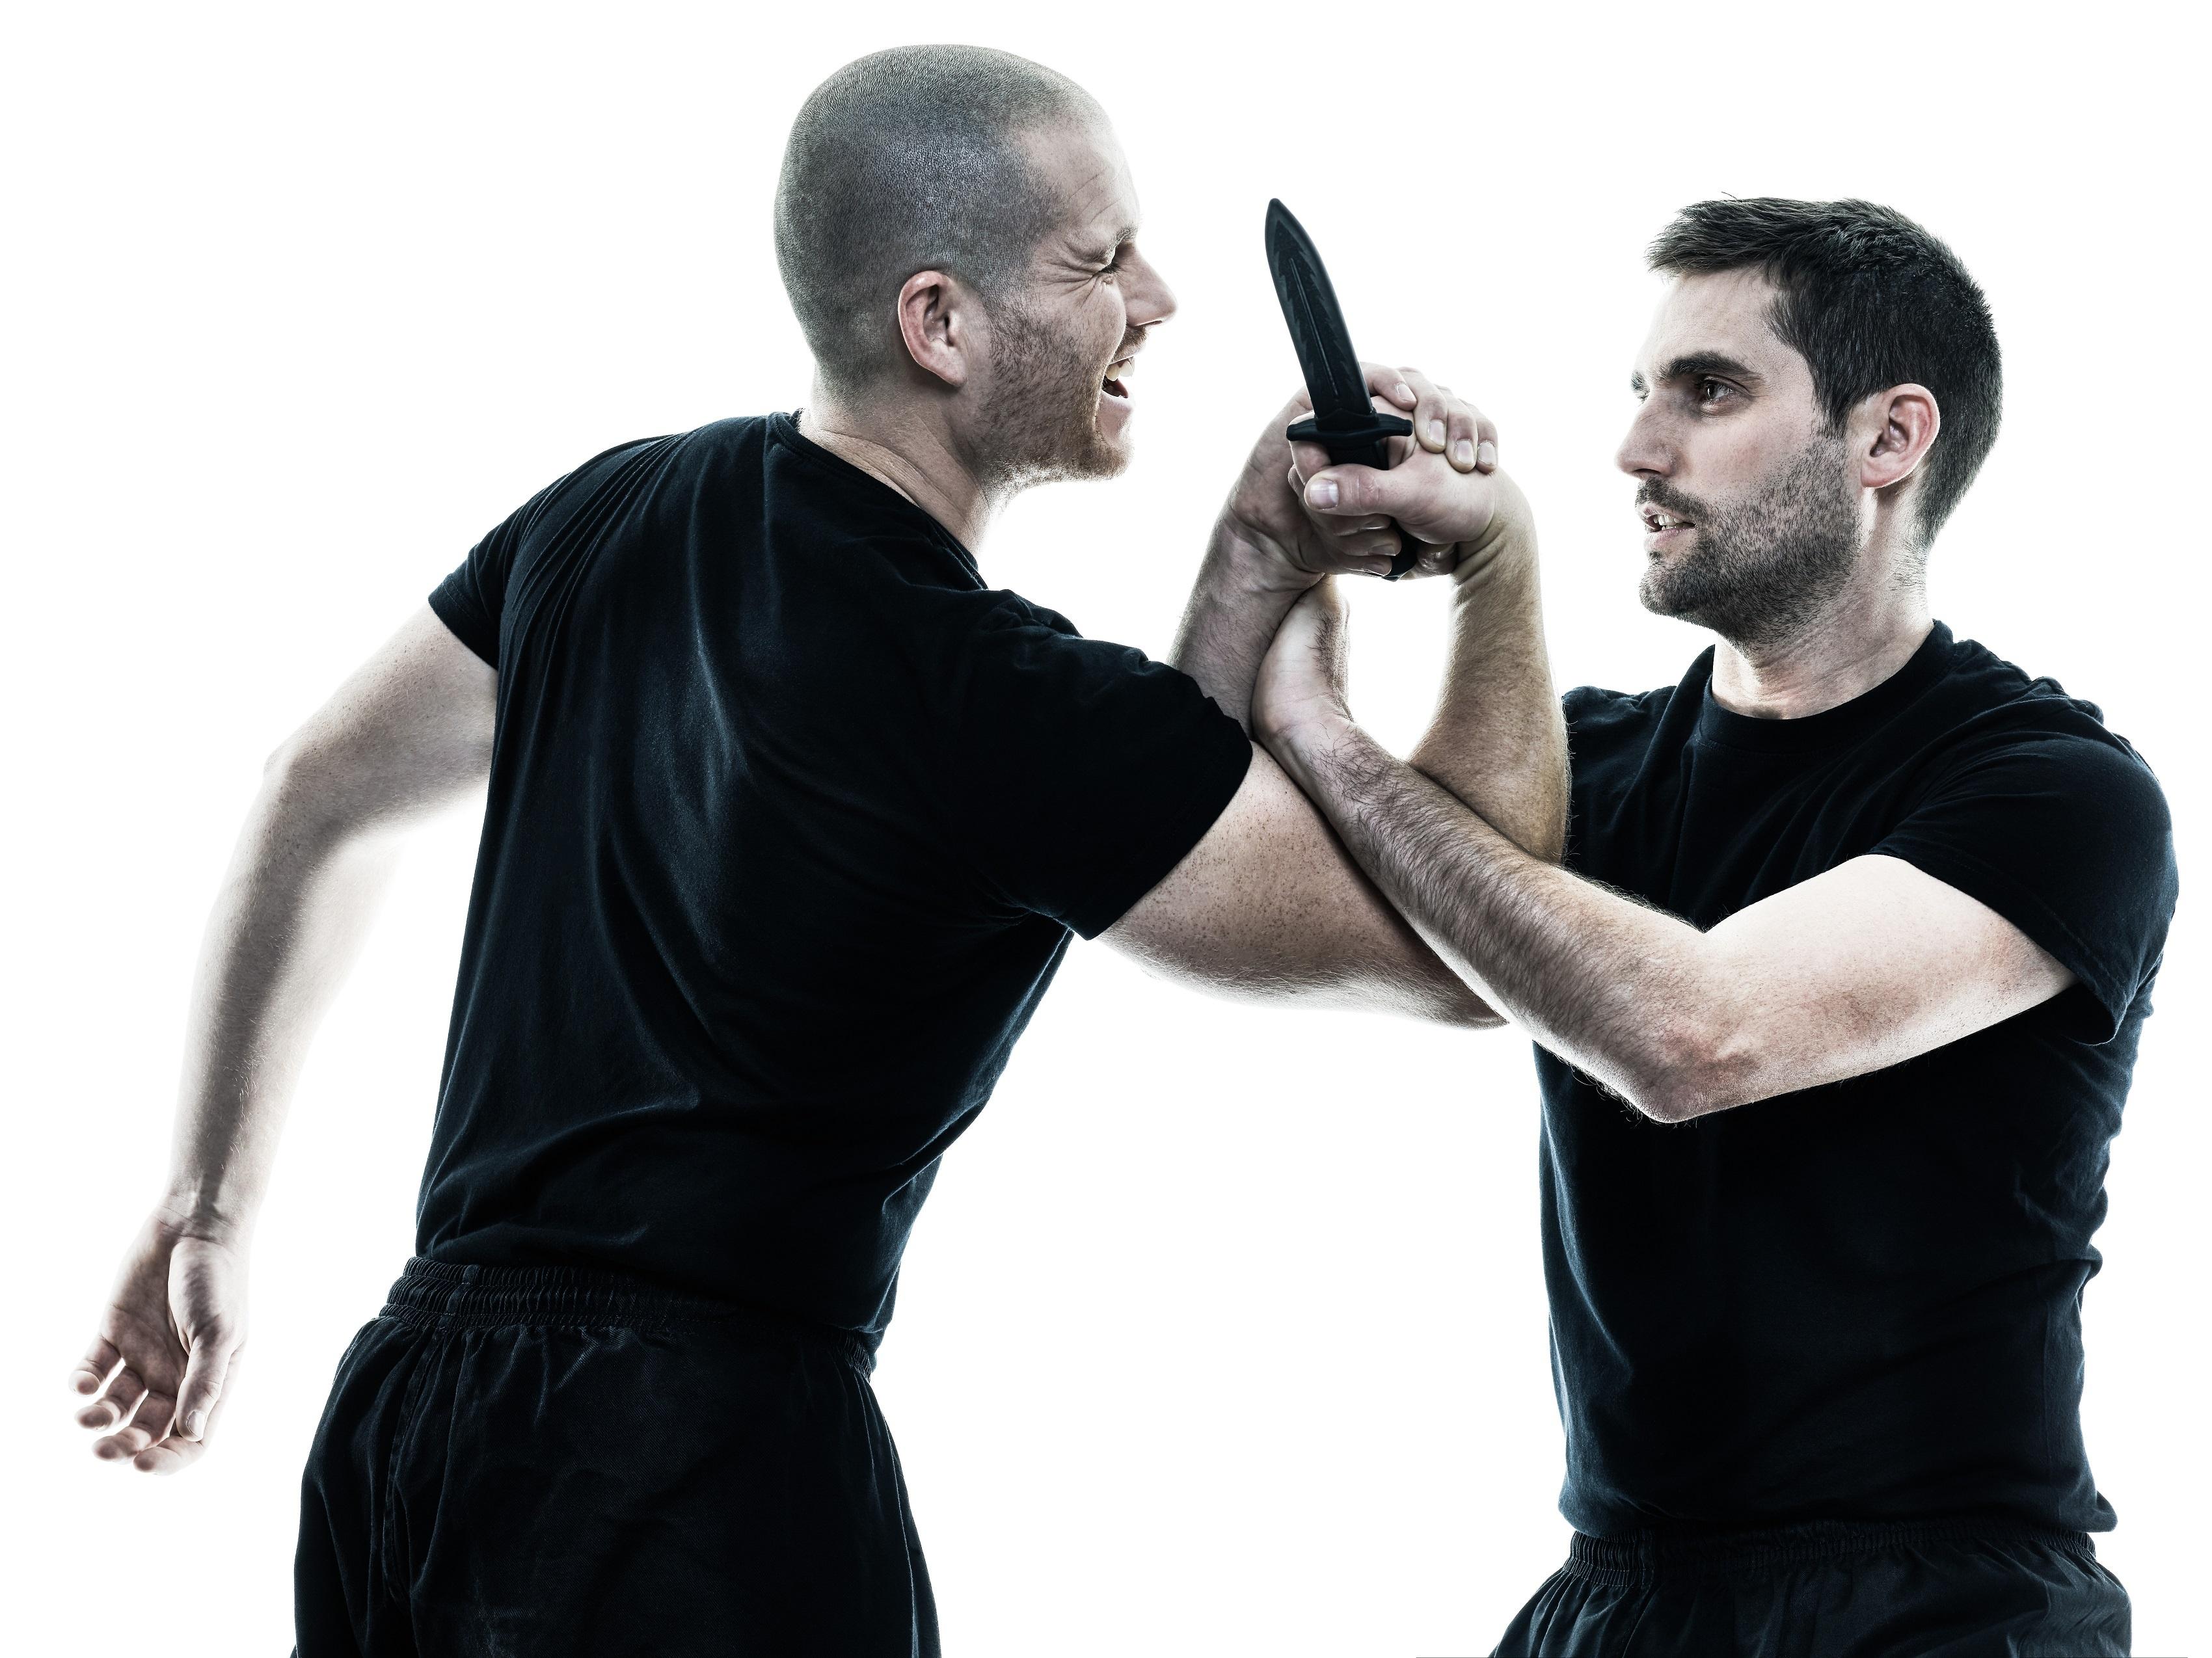 Disarming an attacker is a key component many self-defense arts, like krav maga, teach.